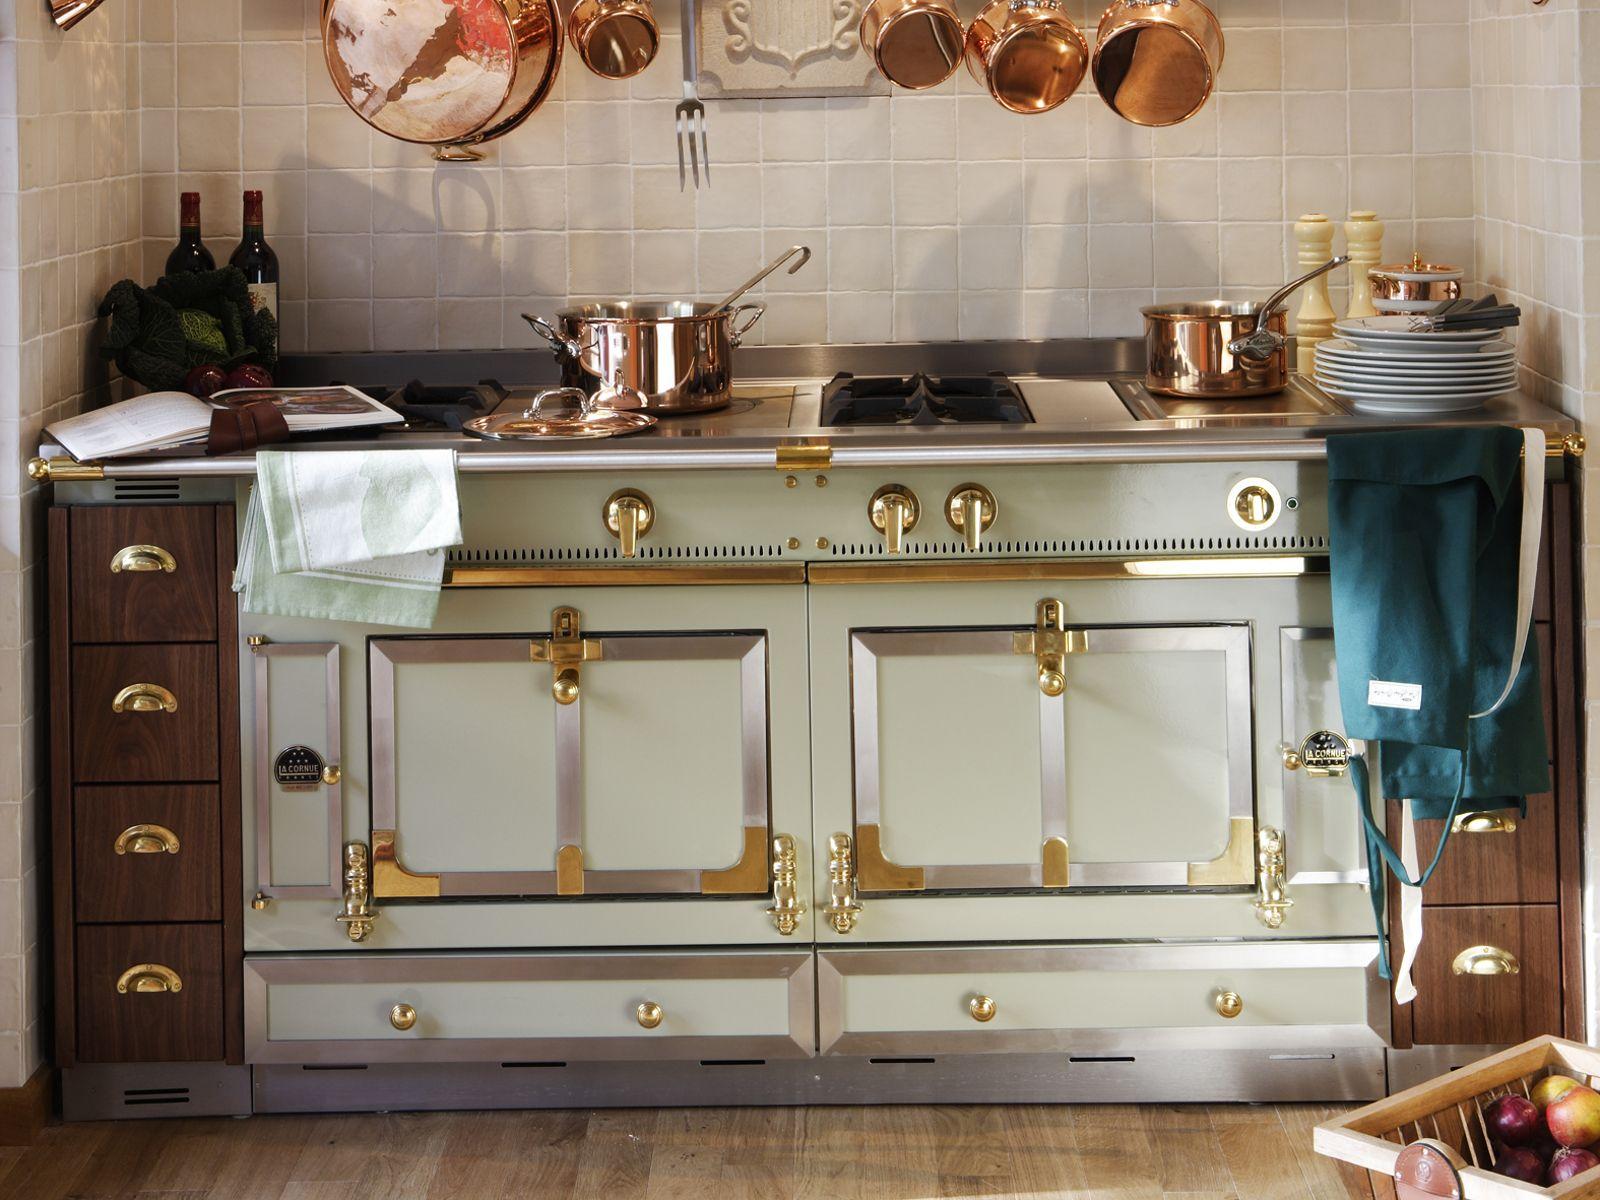 Cuisine La Cornue | Stainless Steel Cooker Chateau 150 By La Cornue Paradise By The